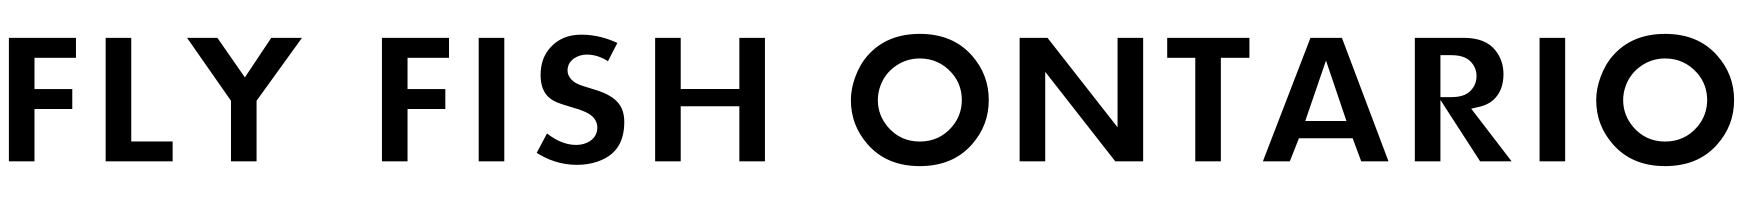 cropped-logo-9.png